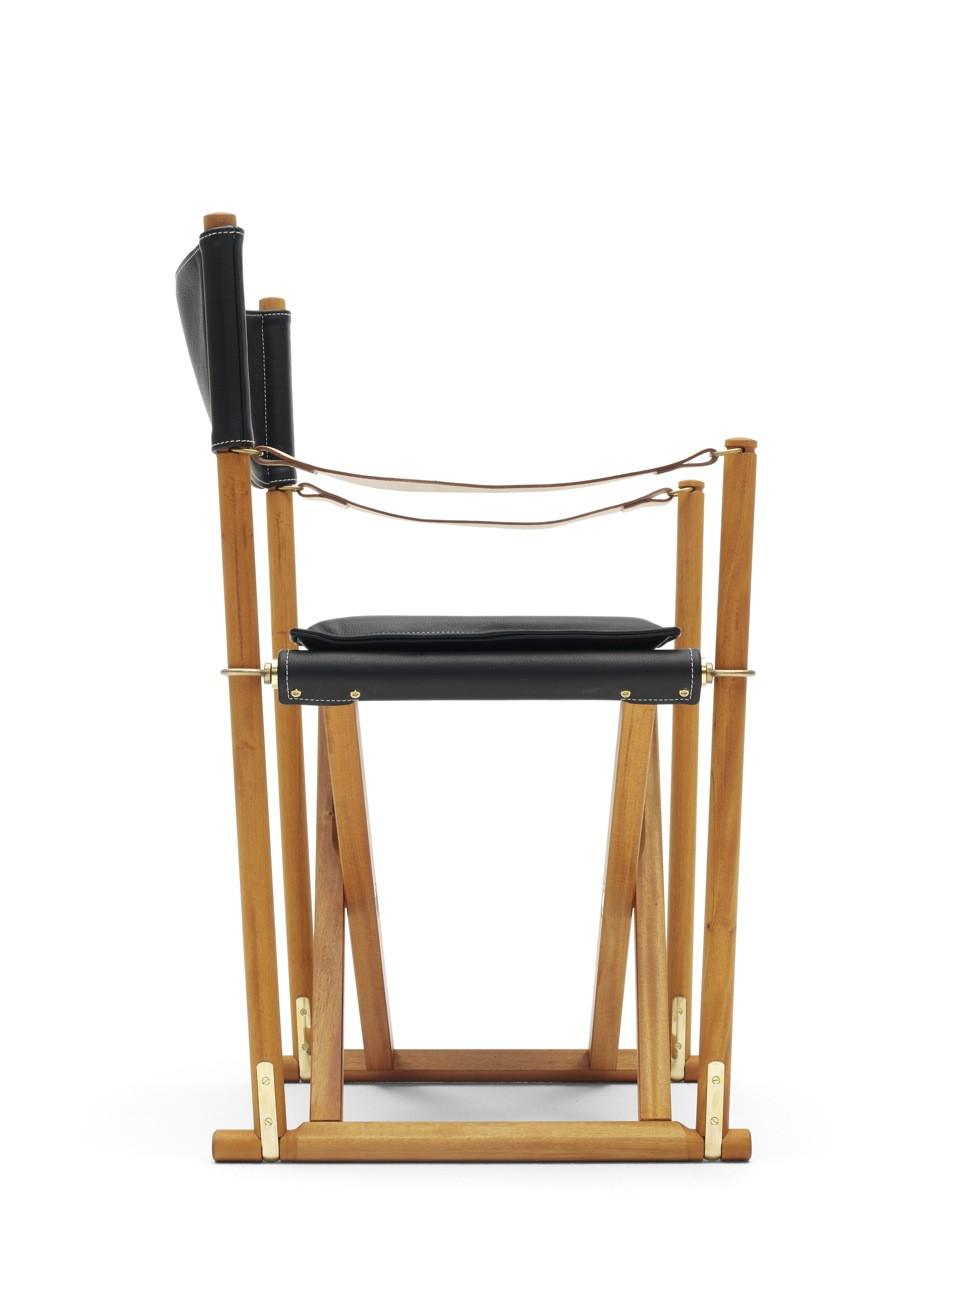 carl_hansen_mogens_koch_MK99200_folding_chair_mahogany_leather_black